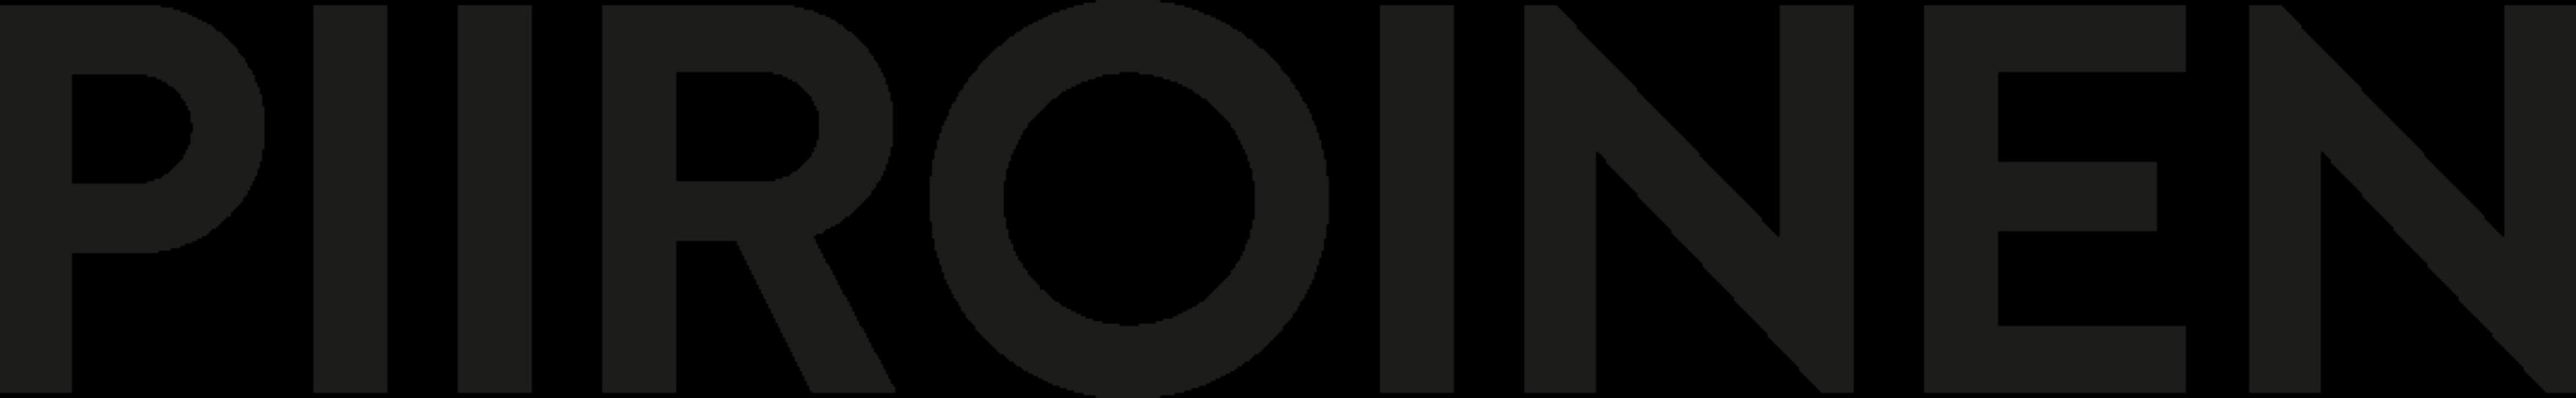 Piiroinen logo